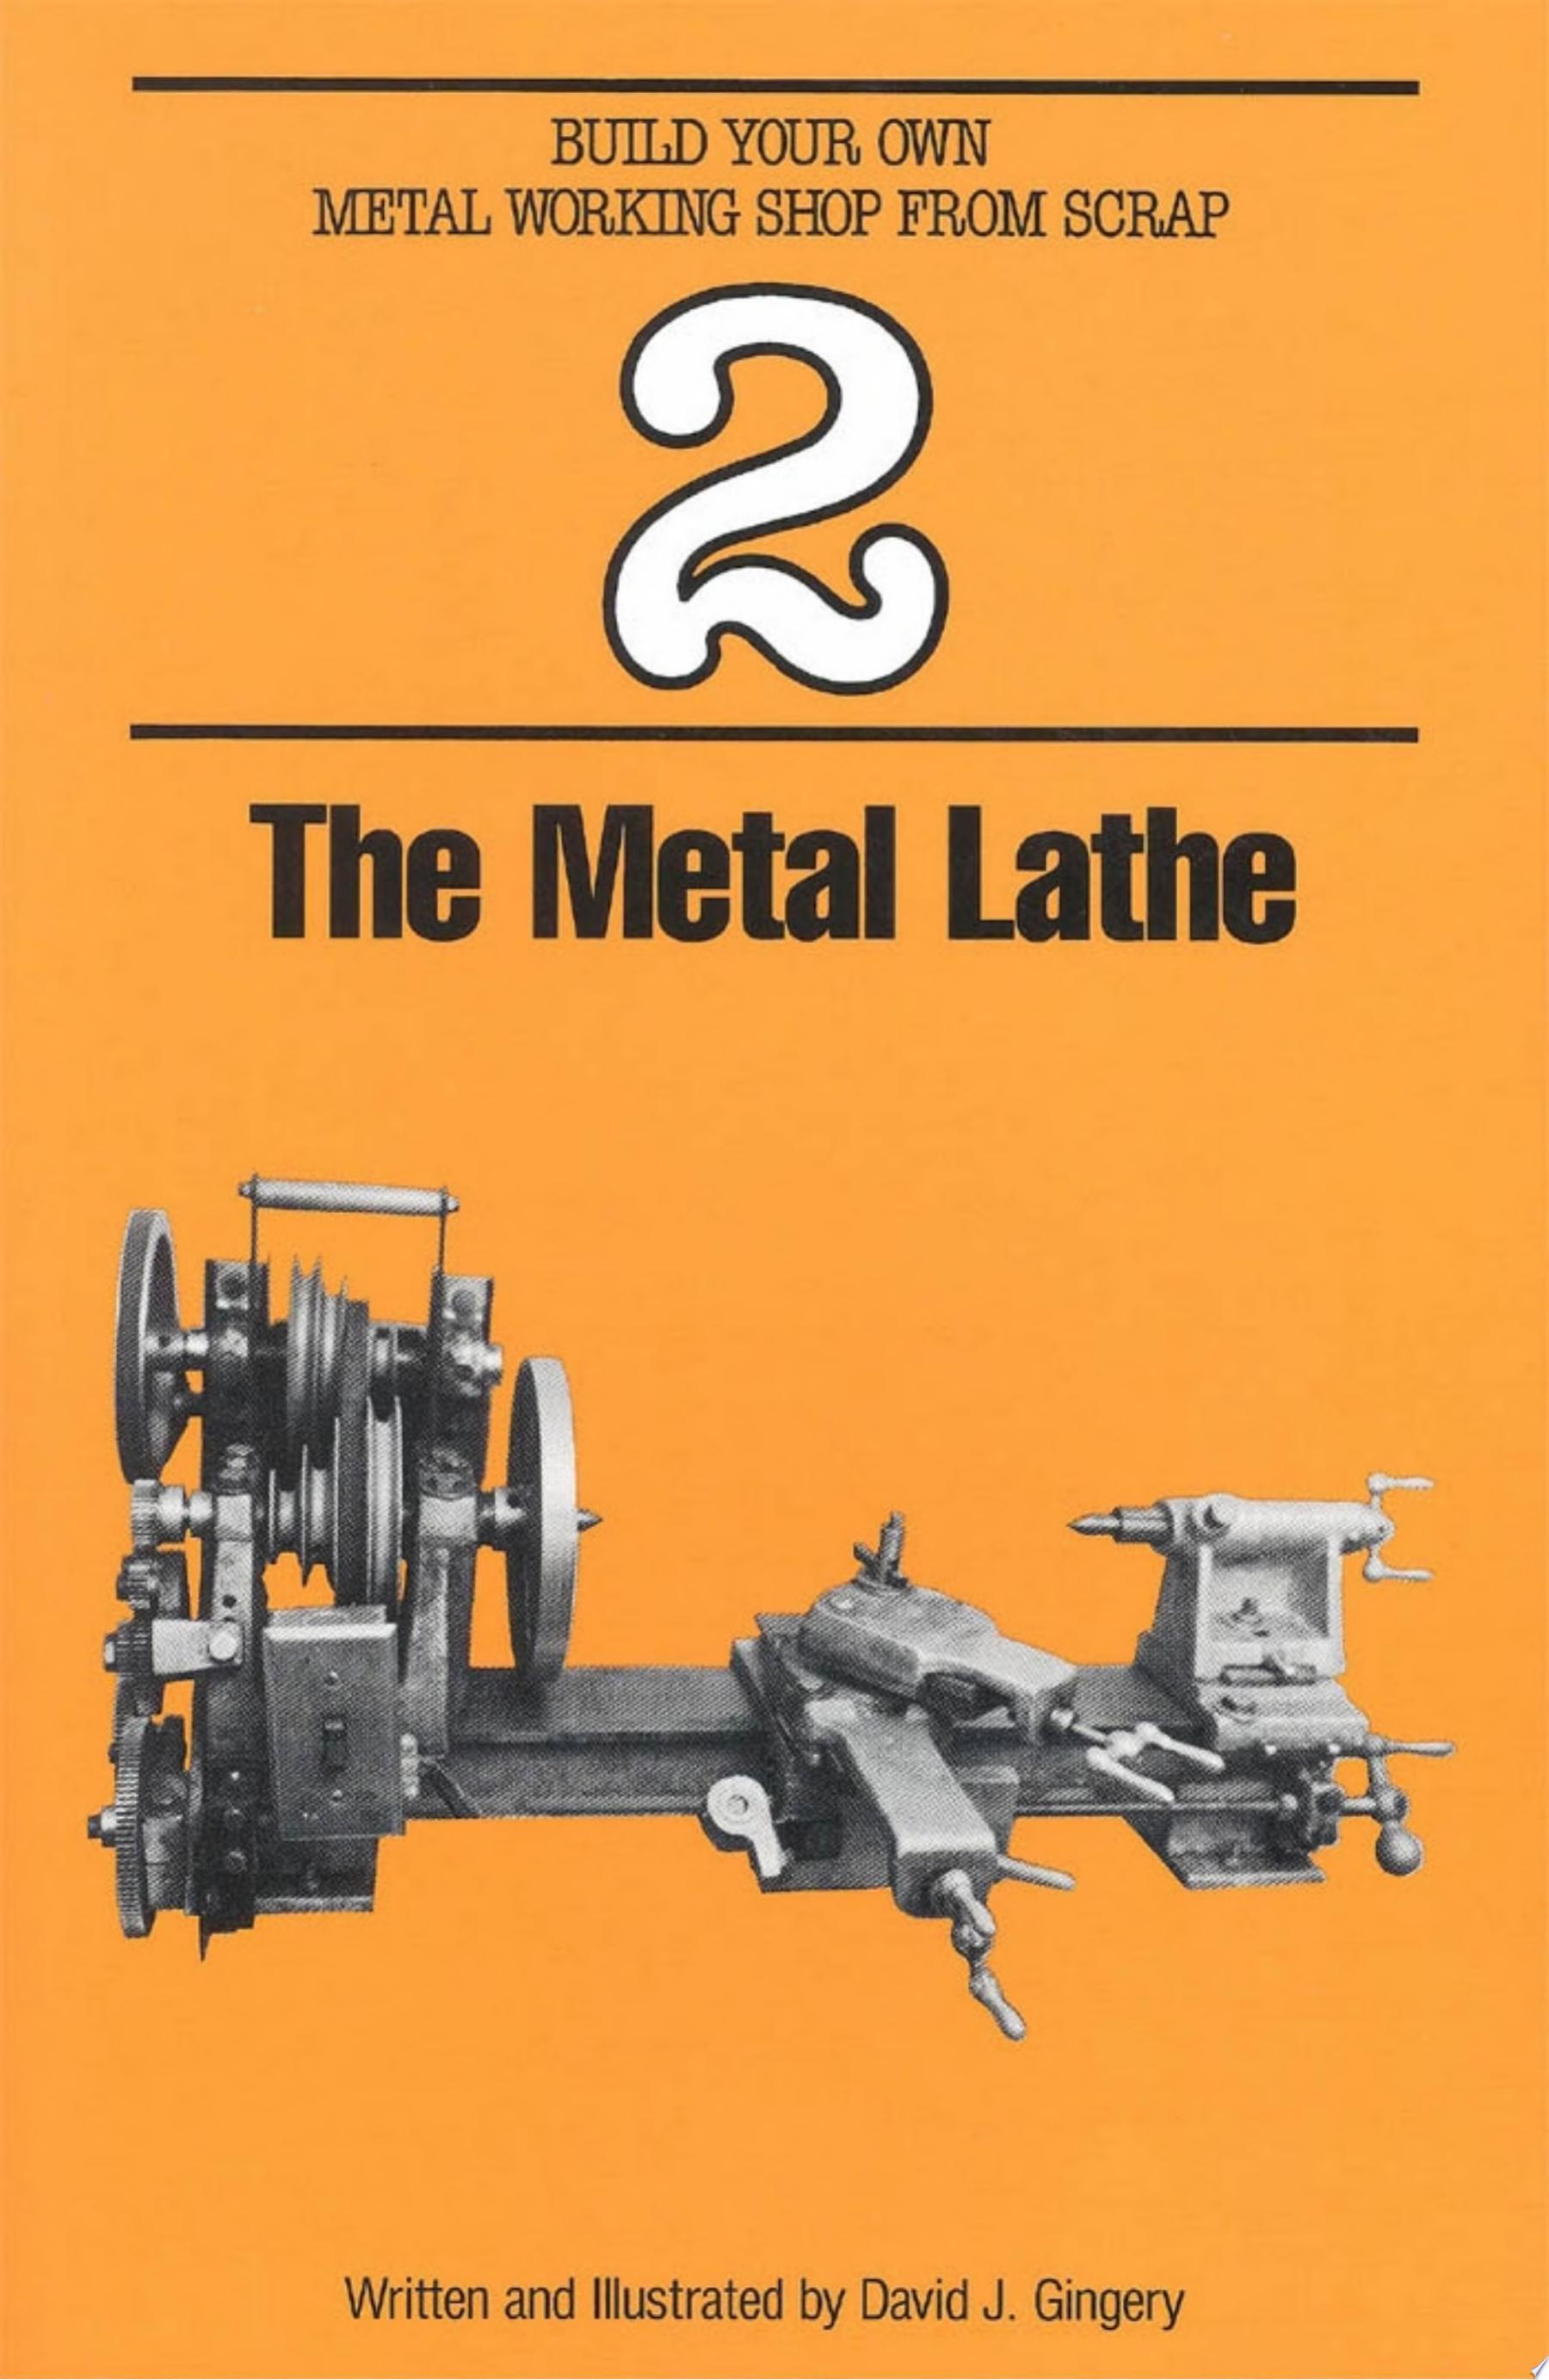 The Metal Lathe